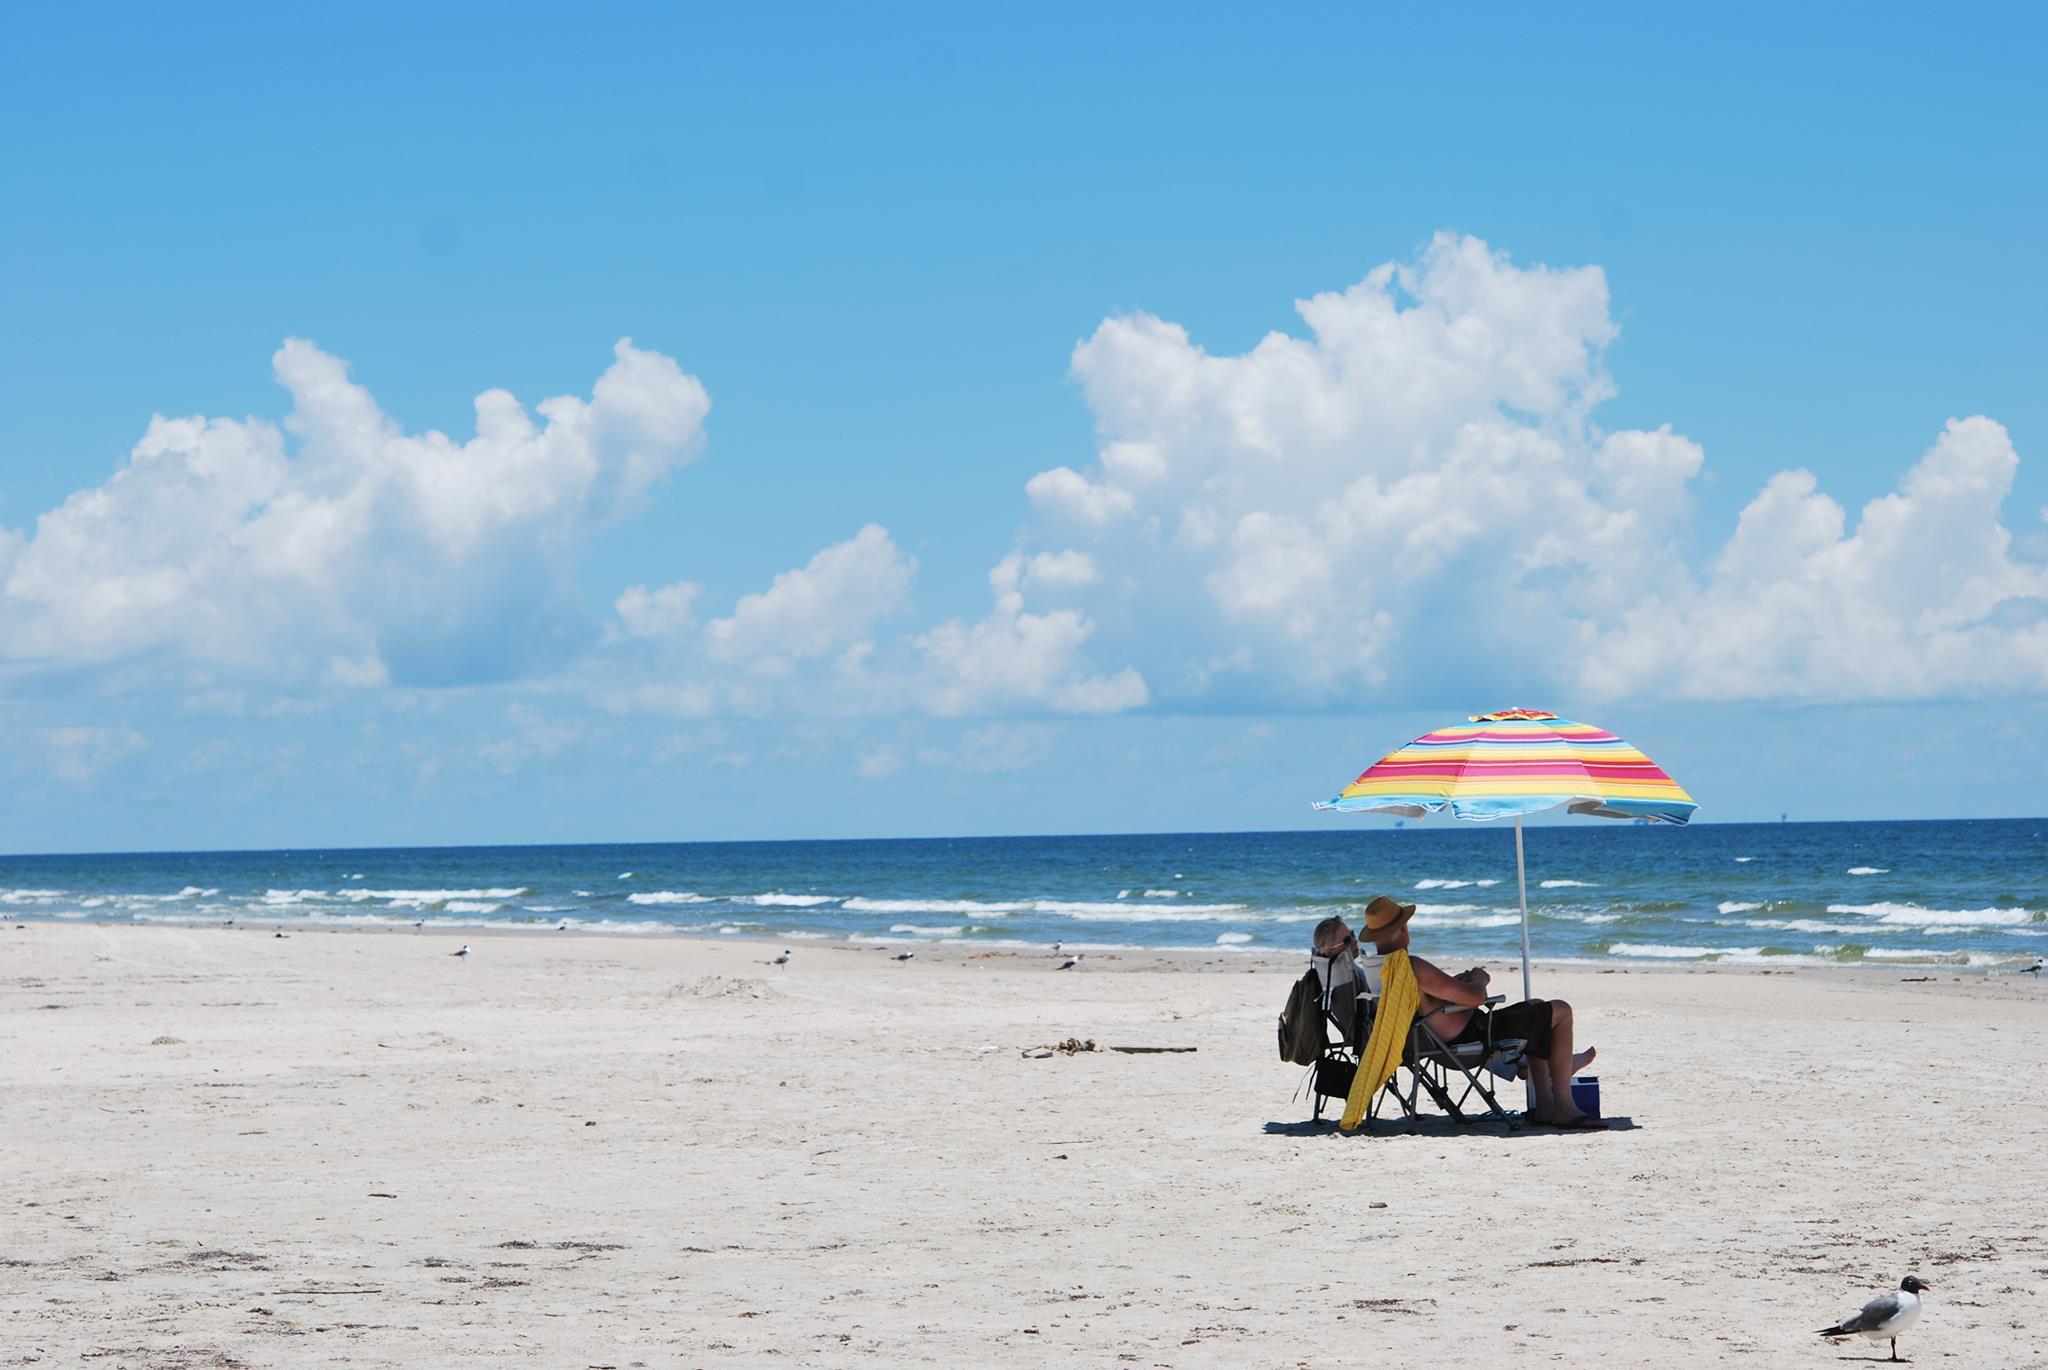 Beautiful Beach in Texas-Padre Island National Seashore, Corpus Christi